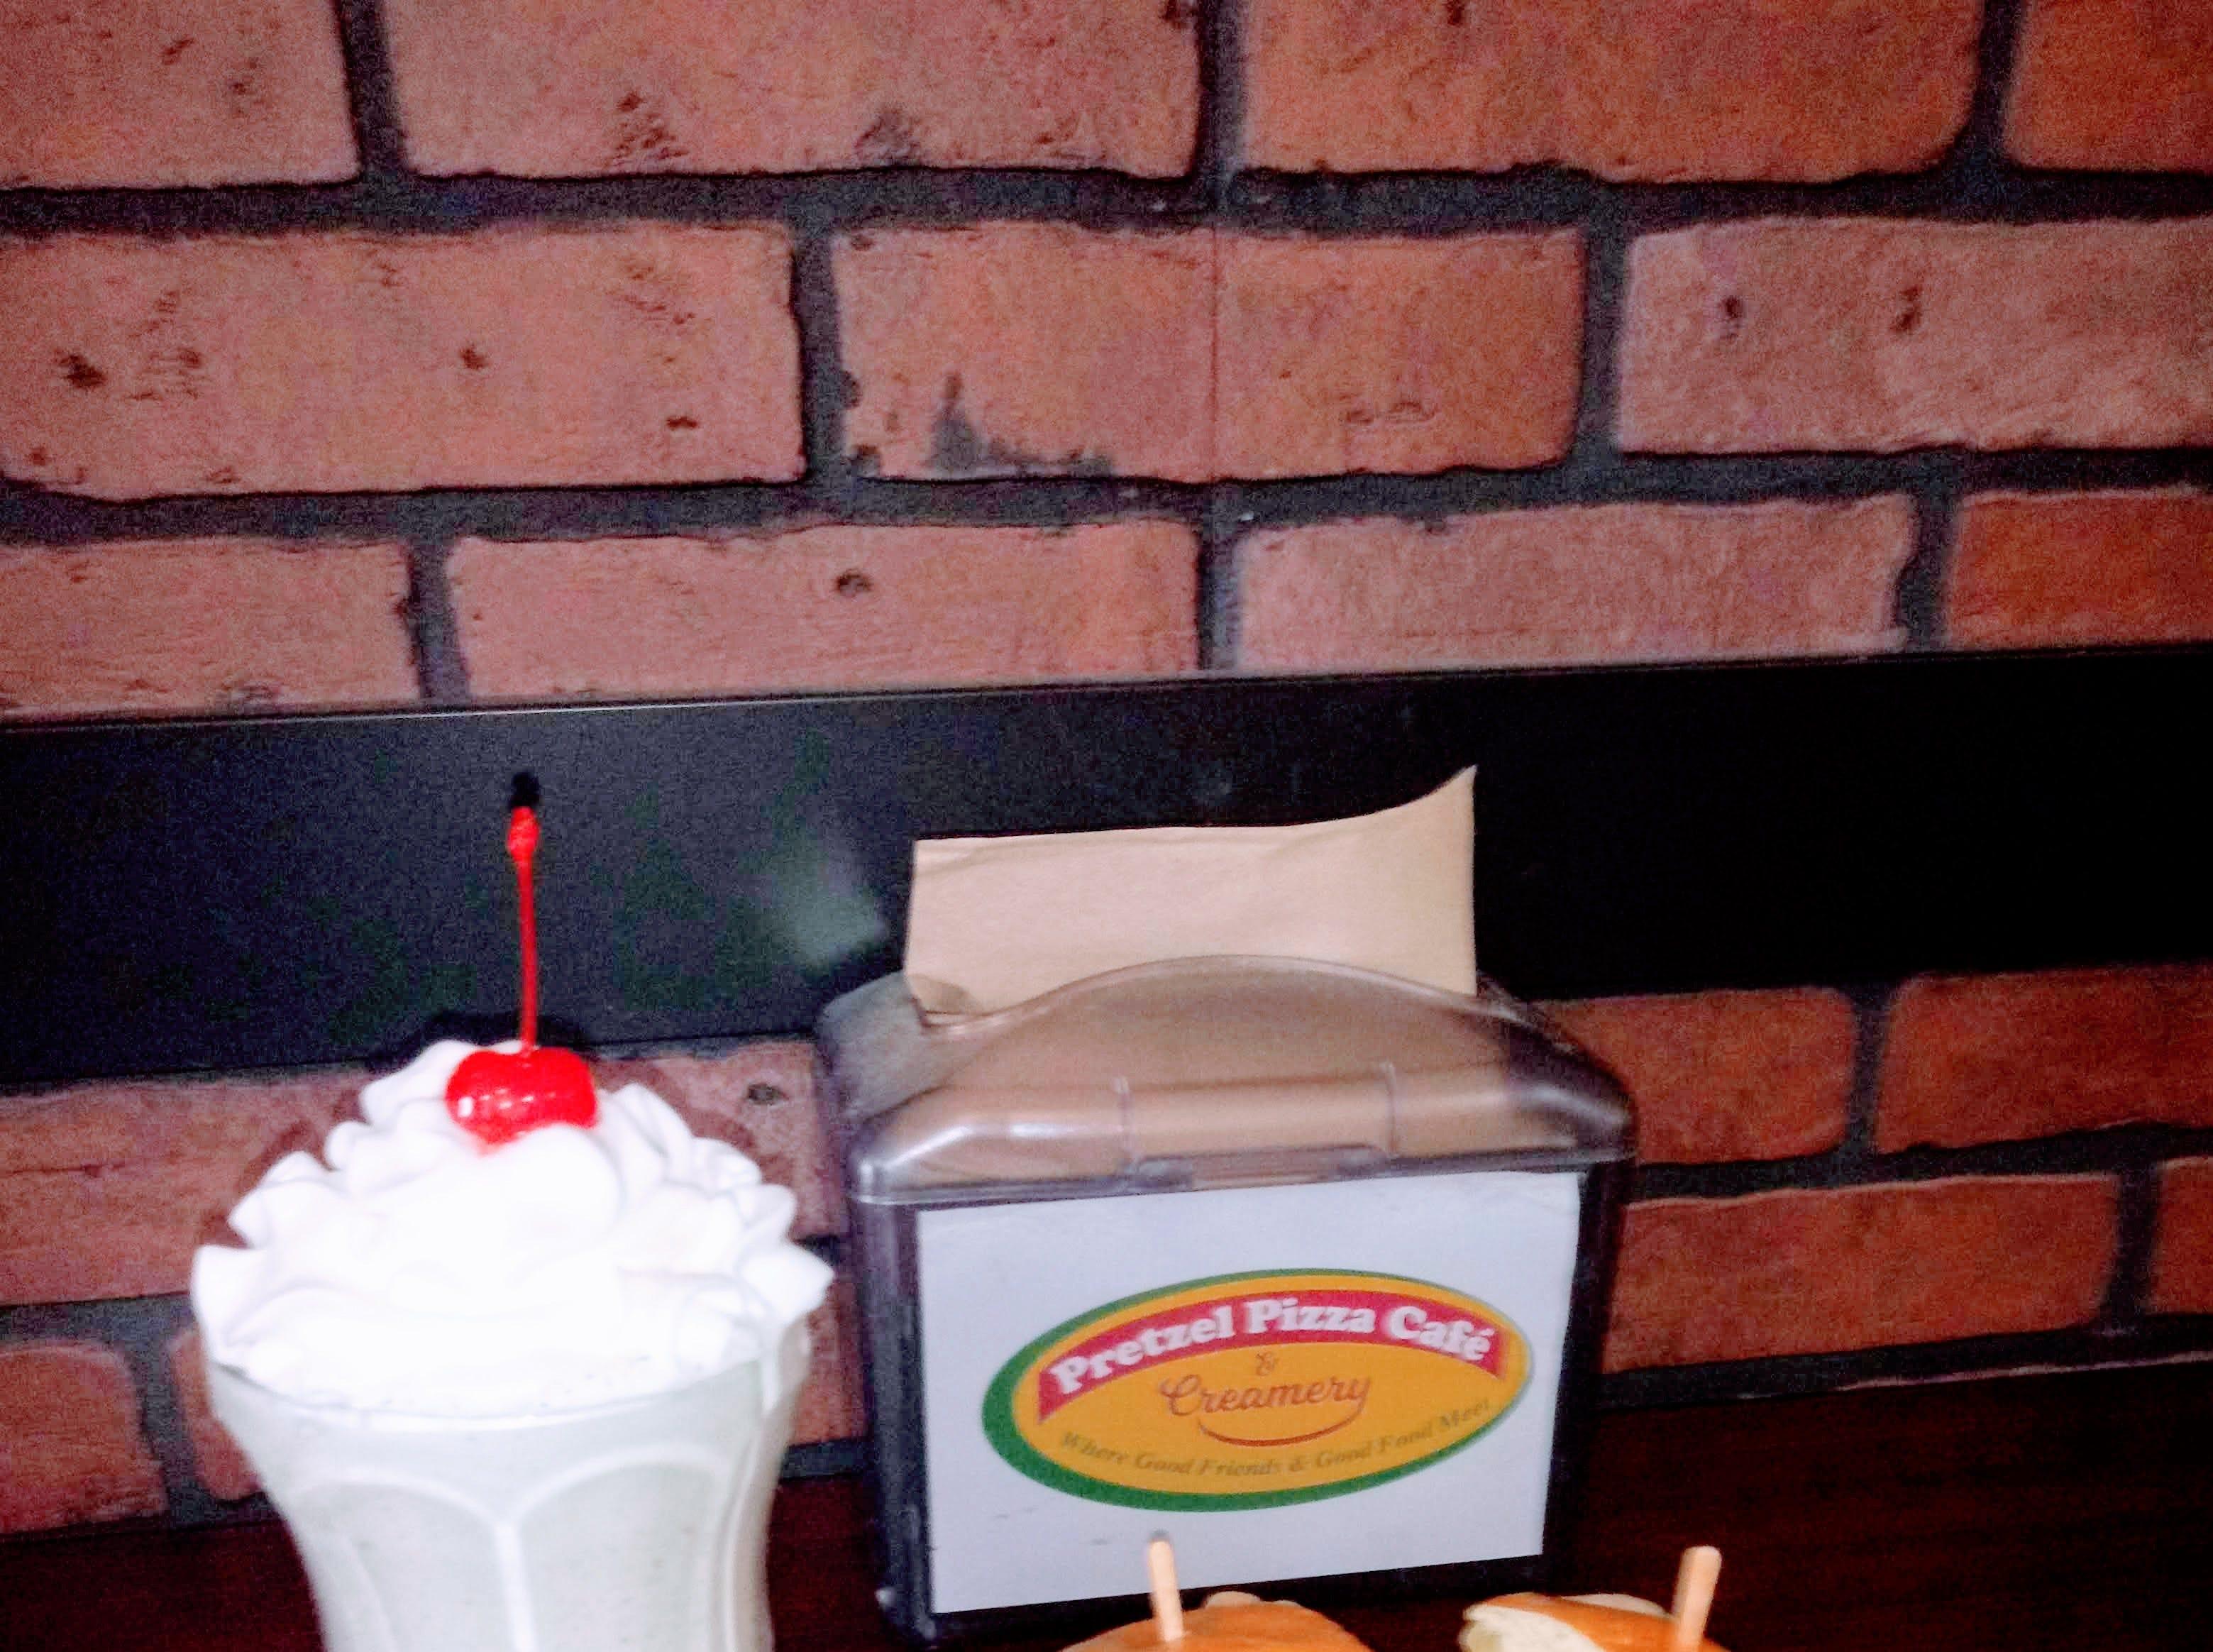 A pretzel sandwich with a milk shake from the Pretzel Pizza Cafe & Creamery on Frederick Street.